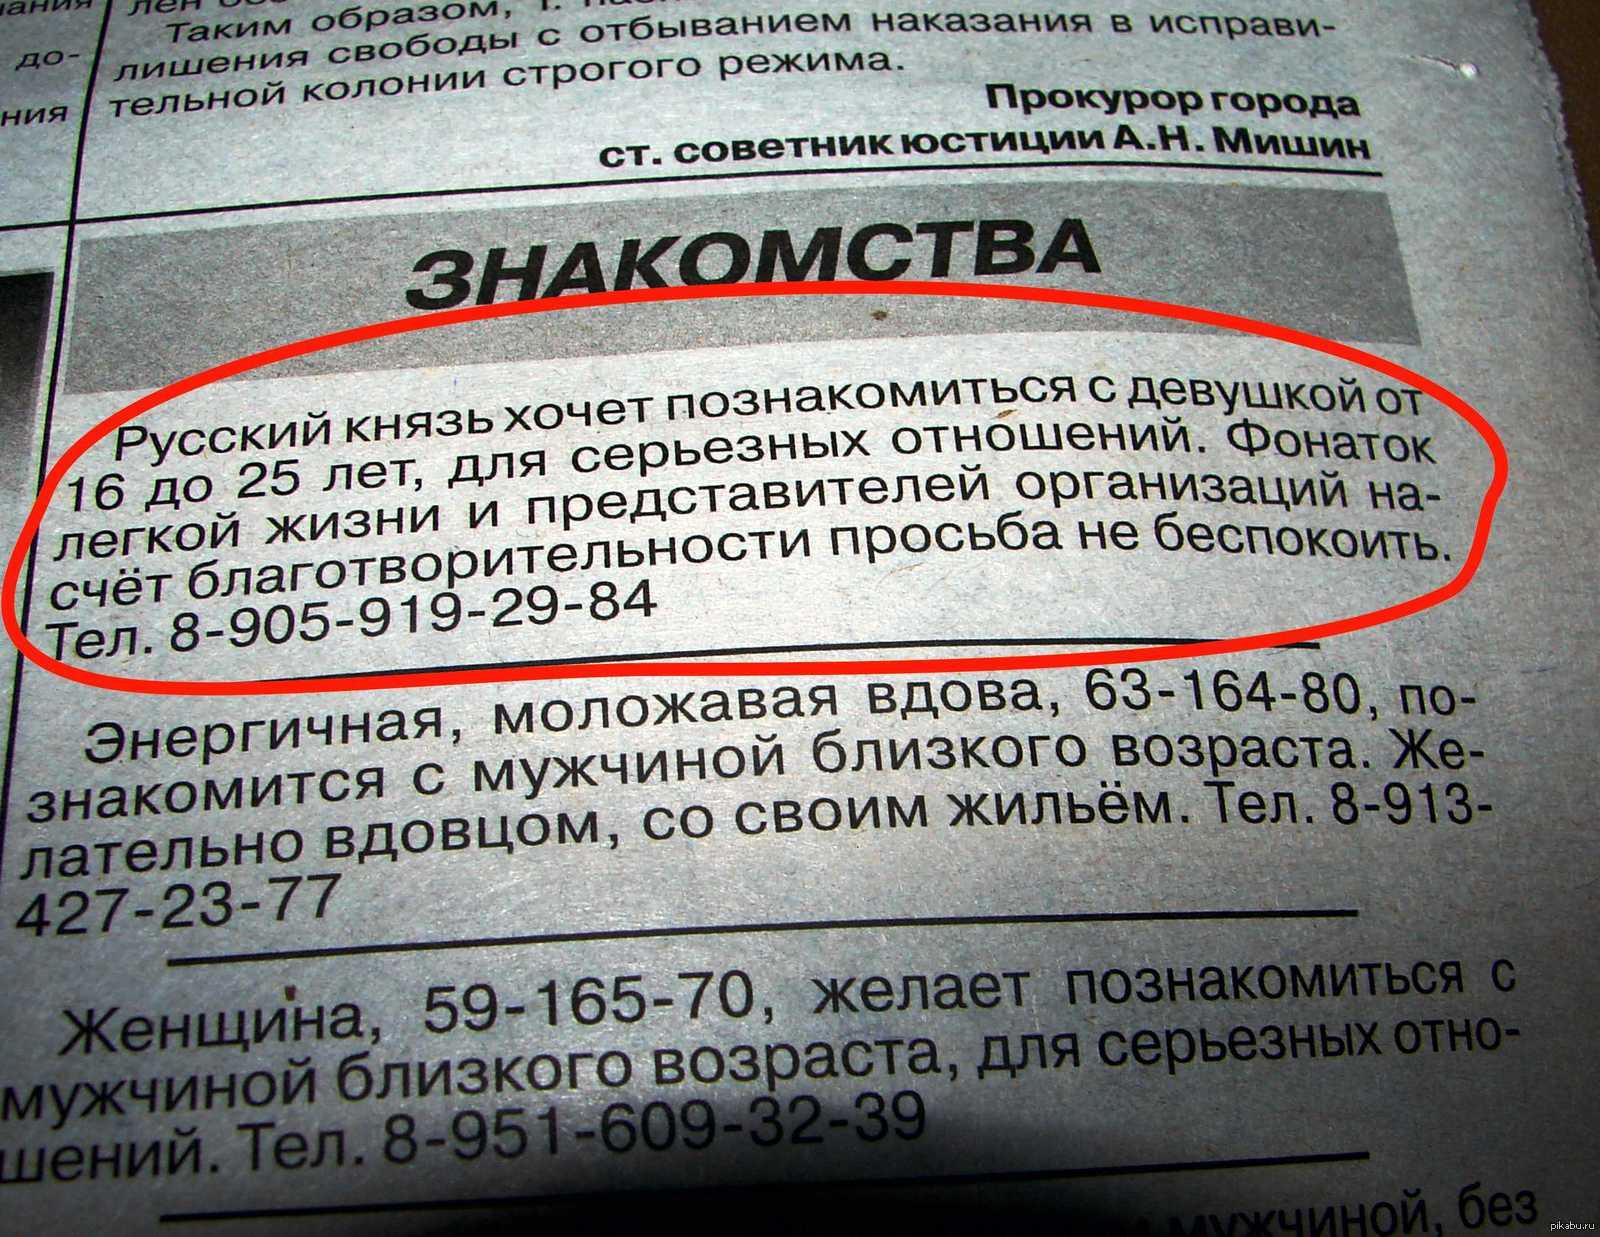 Знакомства газета москва объявления